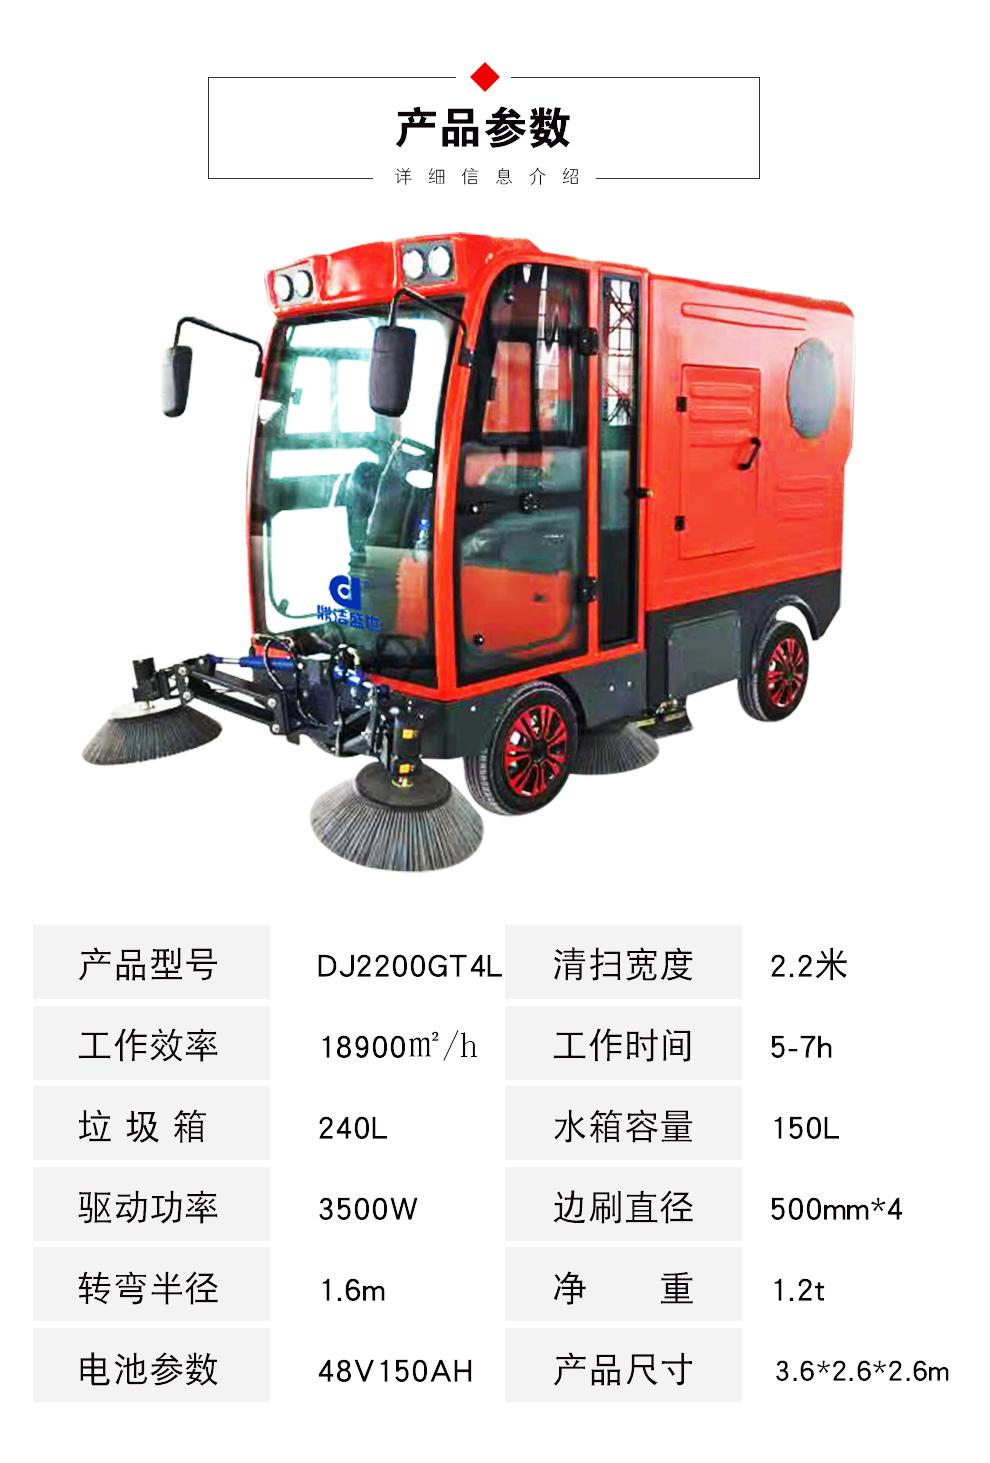 DJ/鼎洁盛世2200GT4L挂桶驾驶式扫地机大容量垃圾桶0